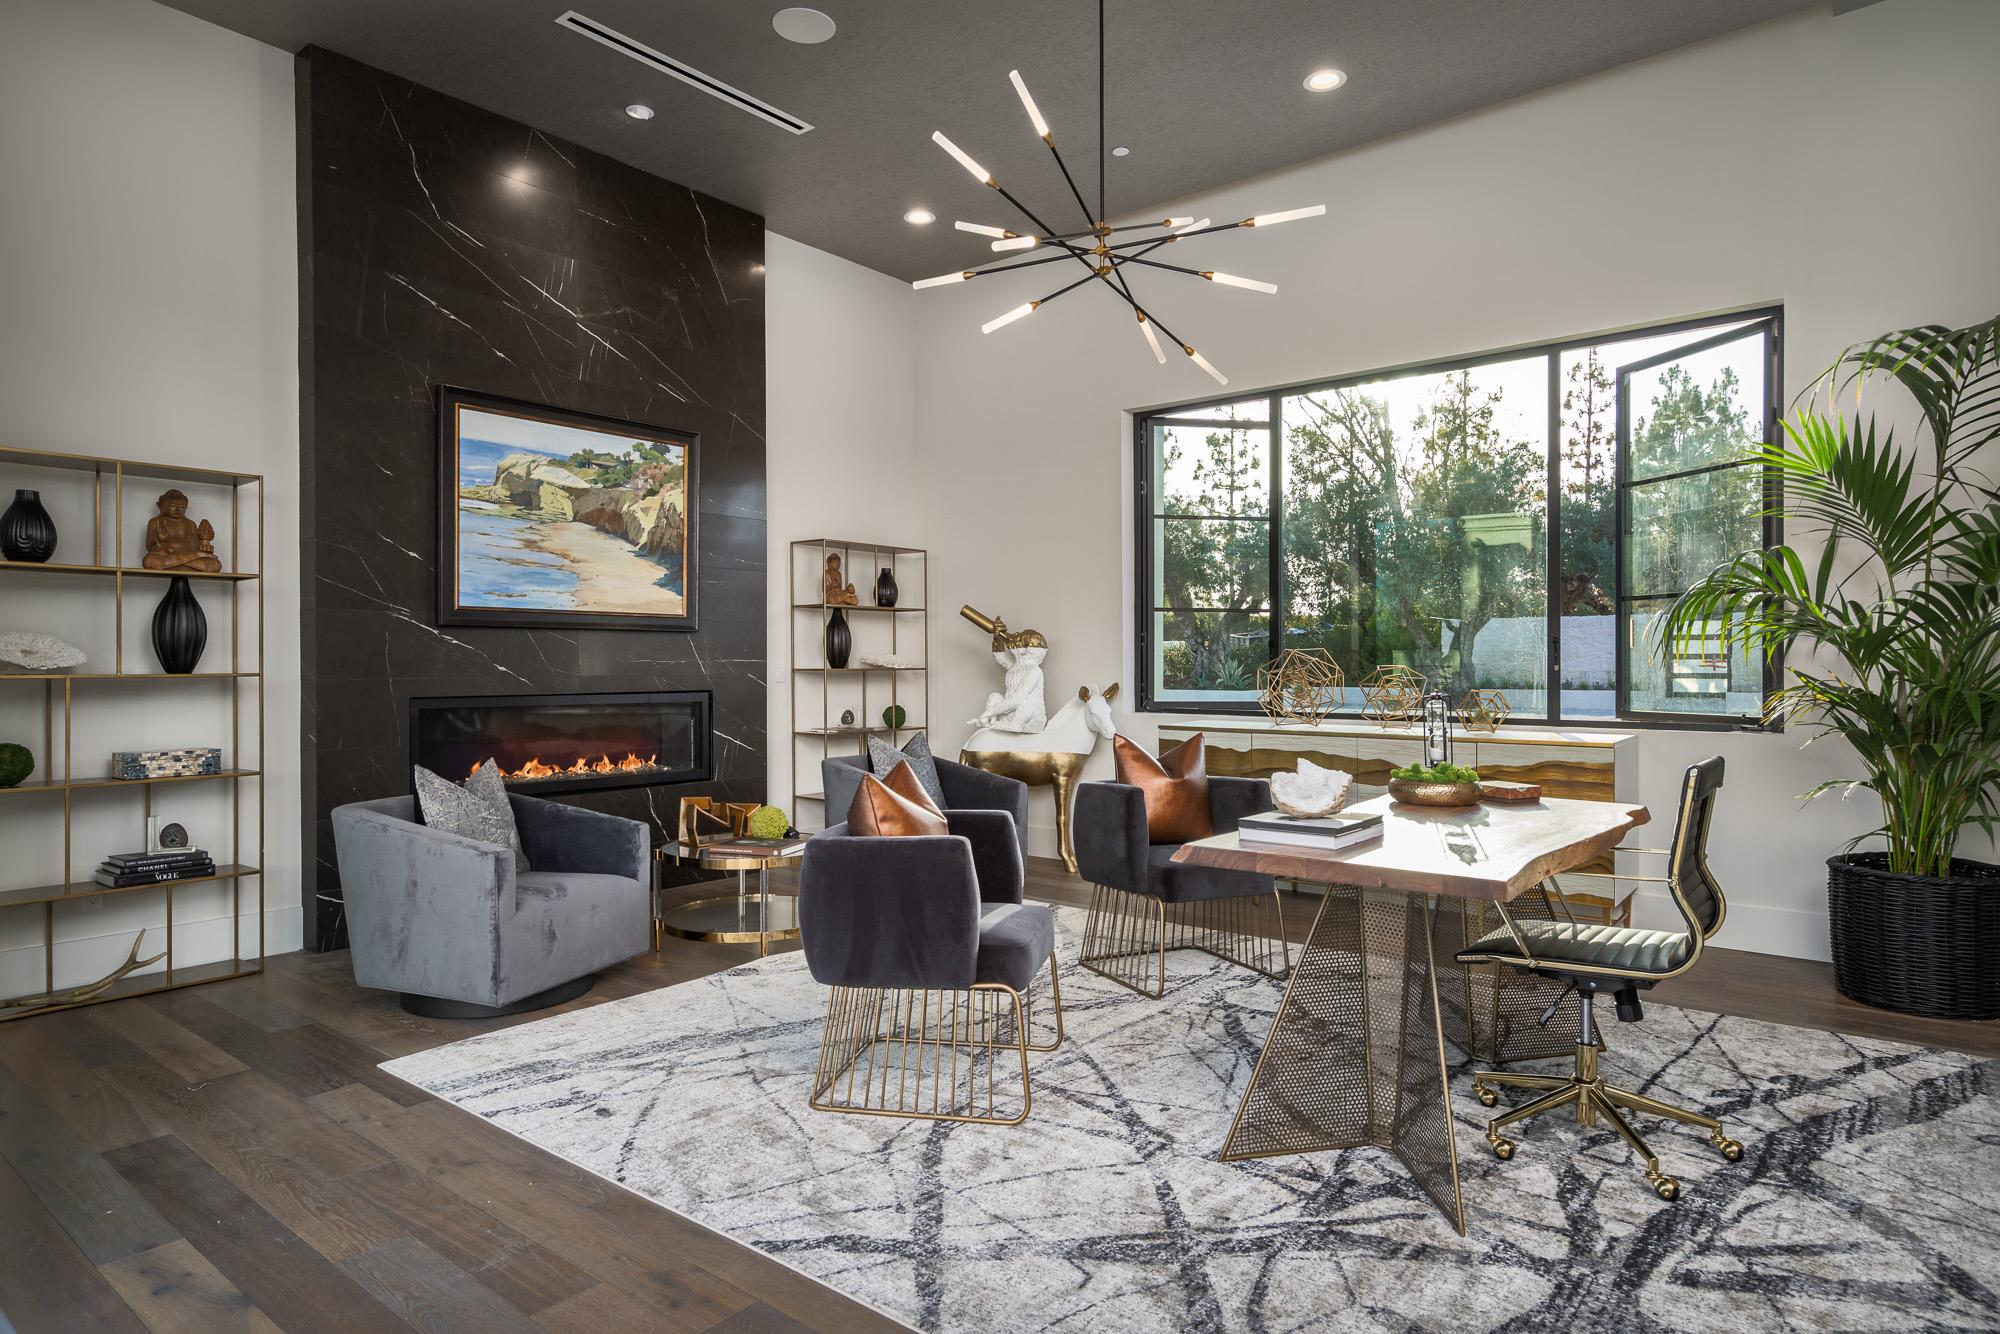 Rancho Santa Fe Covenant -  Rancho Santa Fe, CA 92067